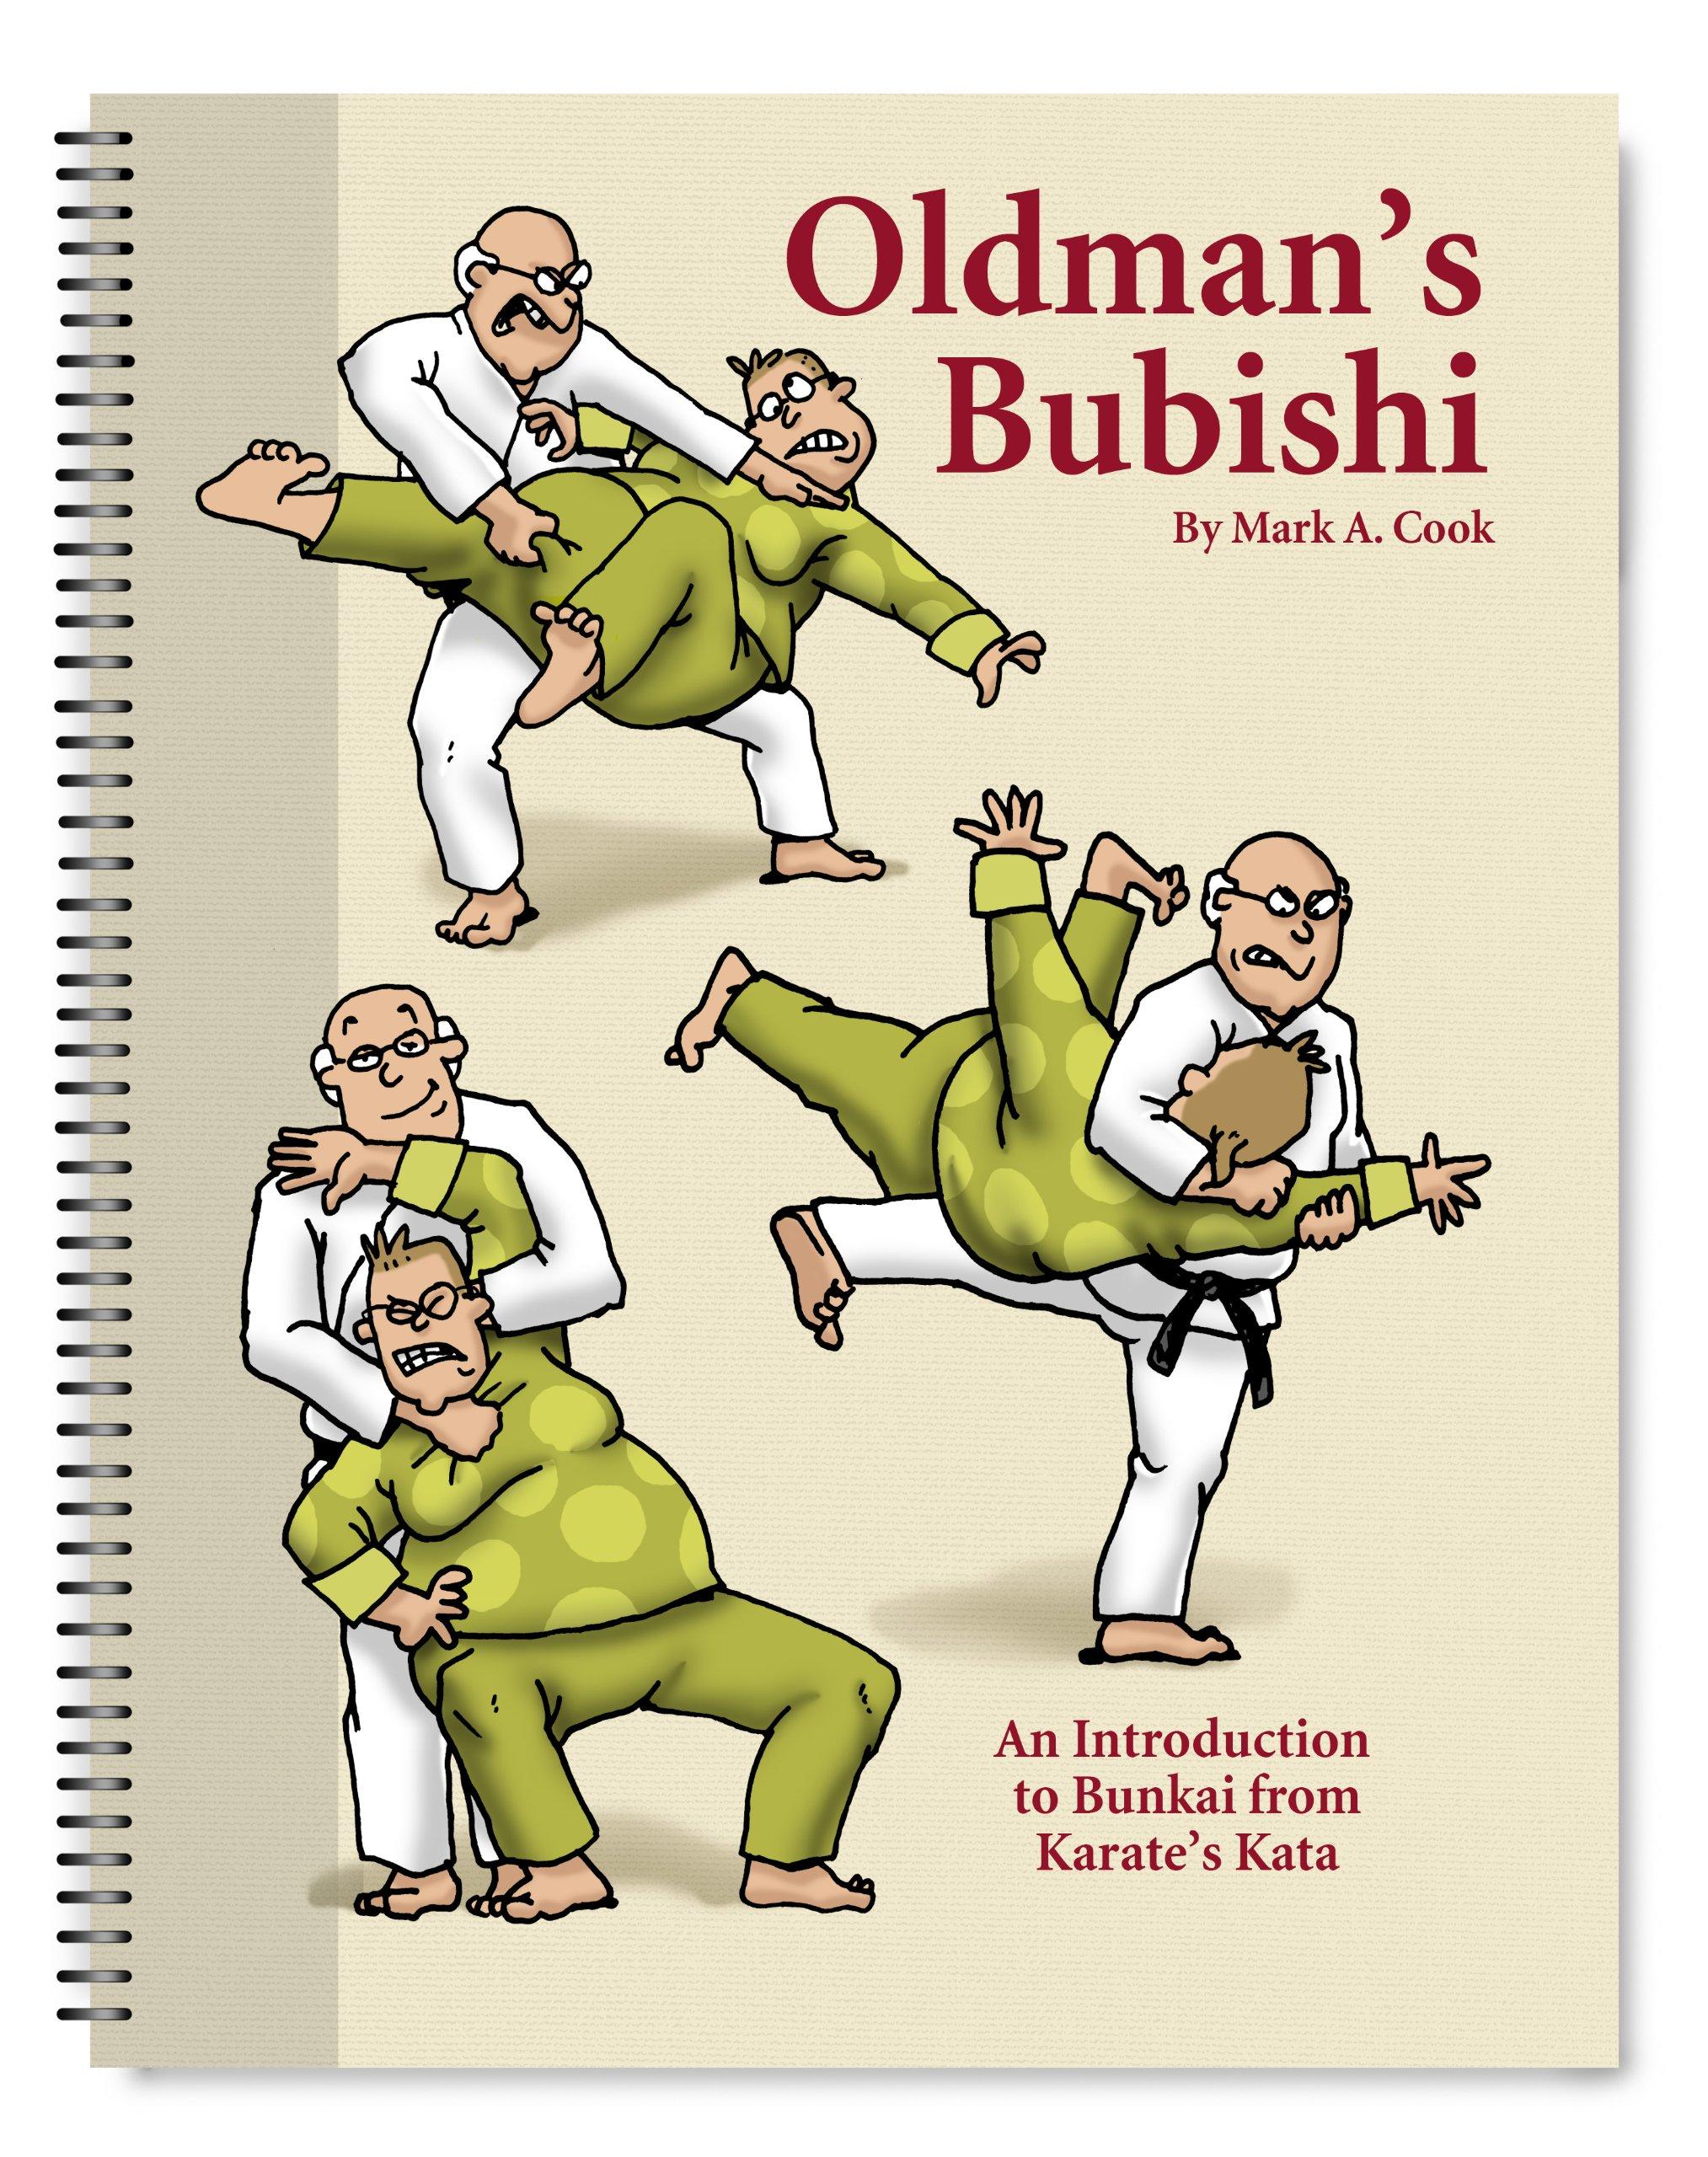 Download Oldman's Bubishi: An Introduction to Bunkai From Karate's Kata ebook